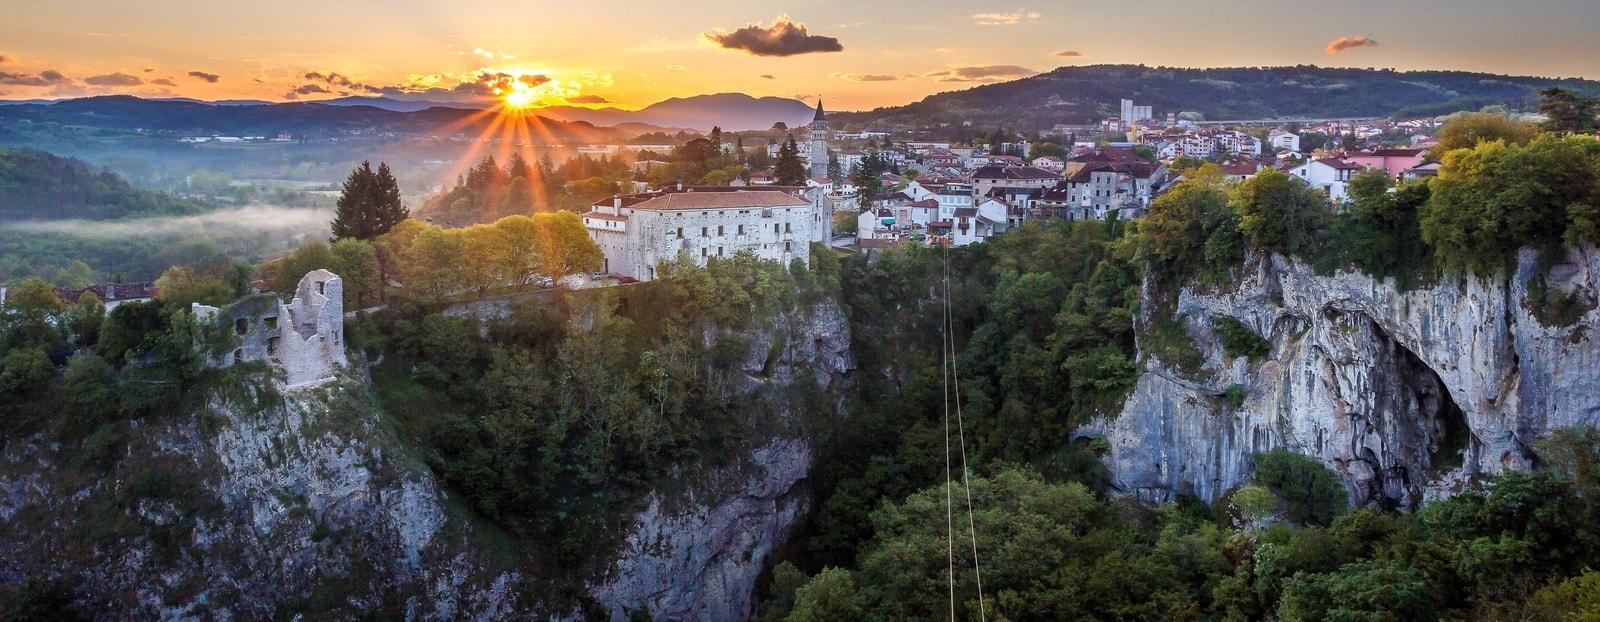 Pazin en Croacia